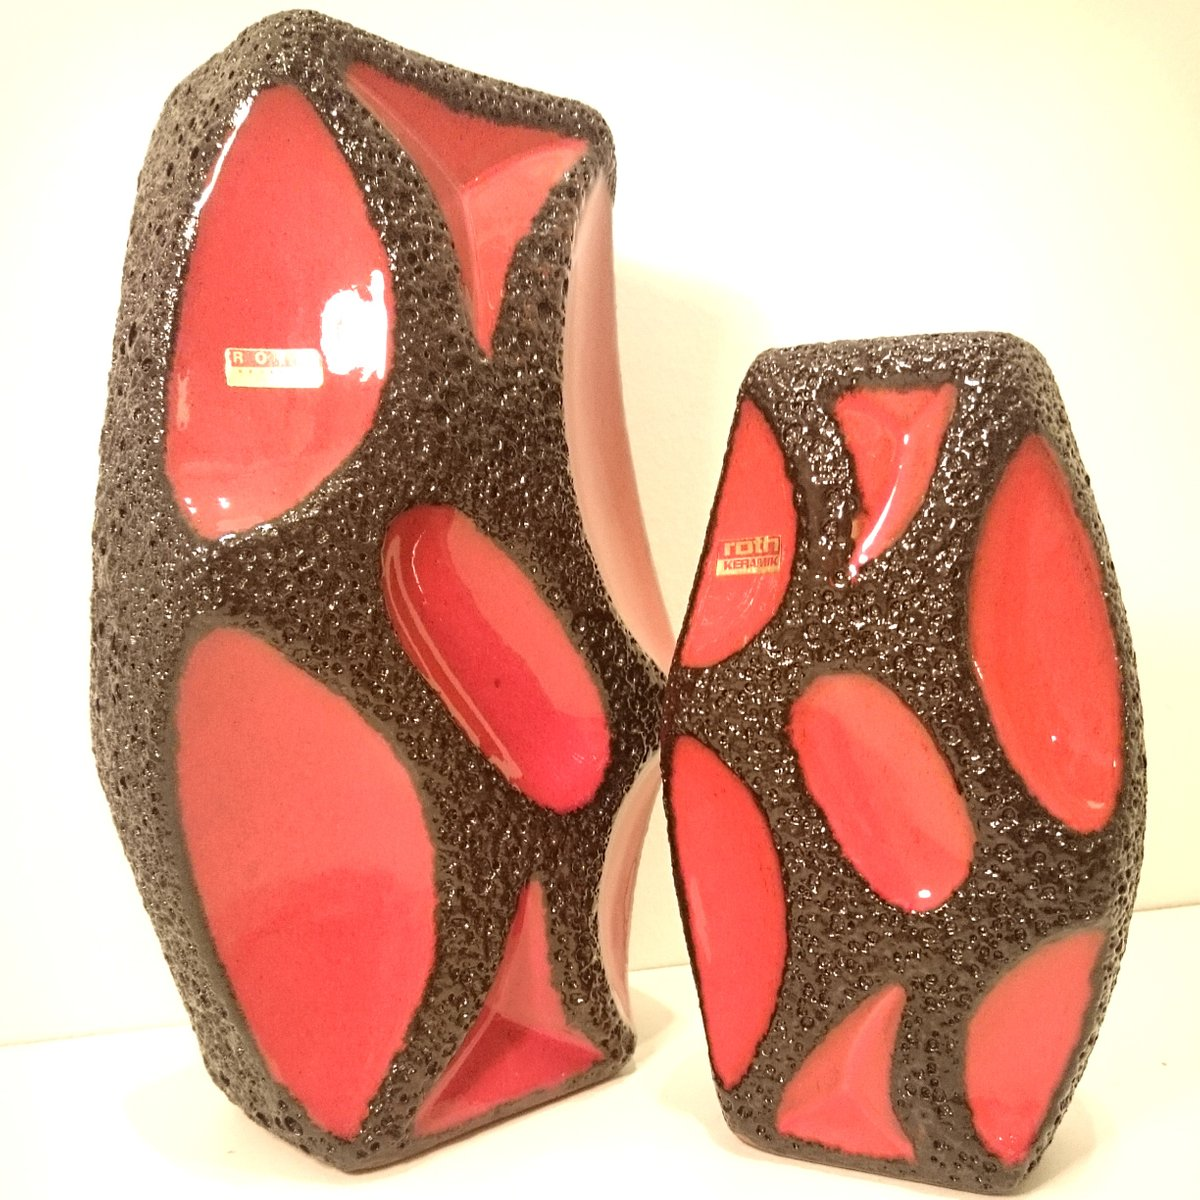 German red and black fat lava lozenge vases from roth 1960s for german red and black fat lava lozenge vases from roth 1960s reviewsmspy